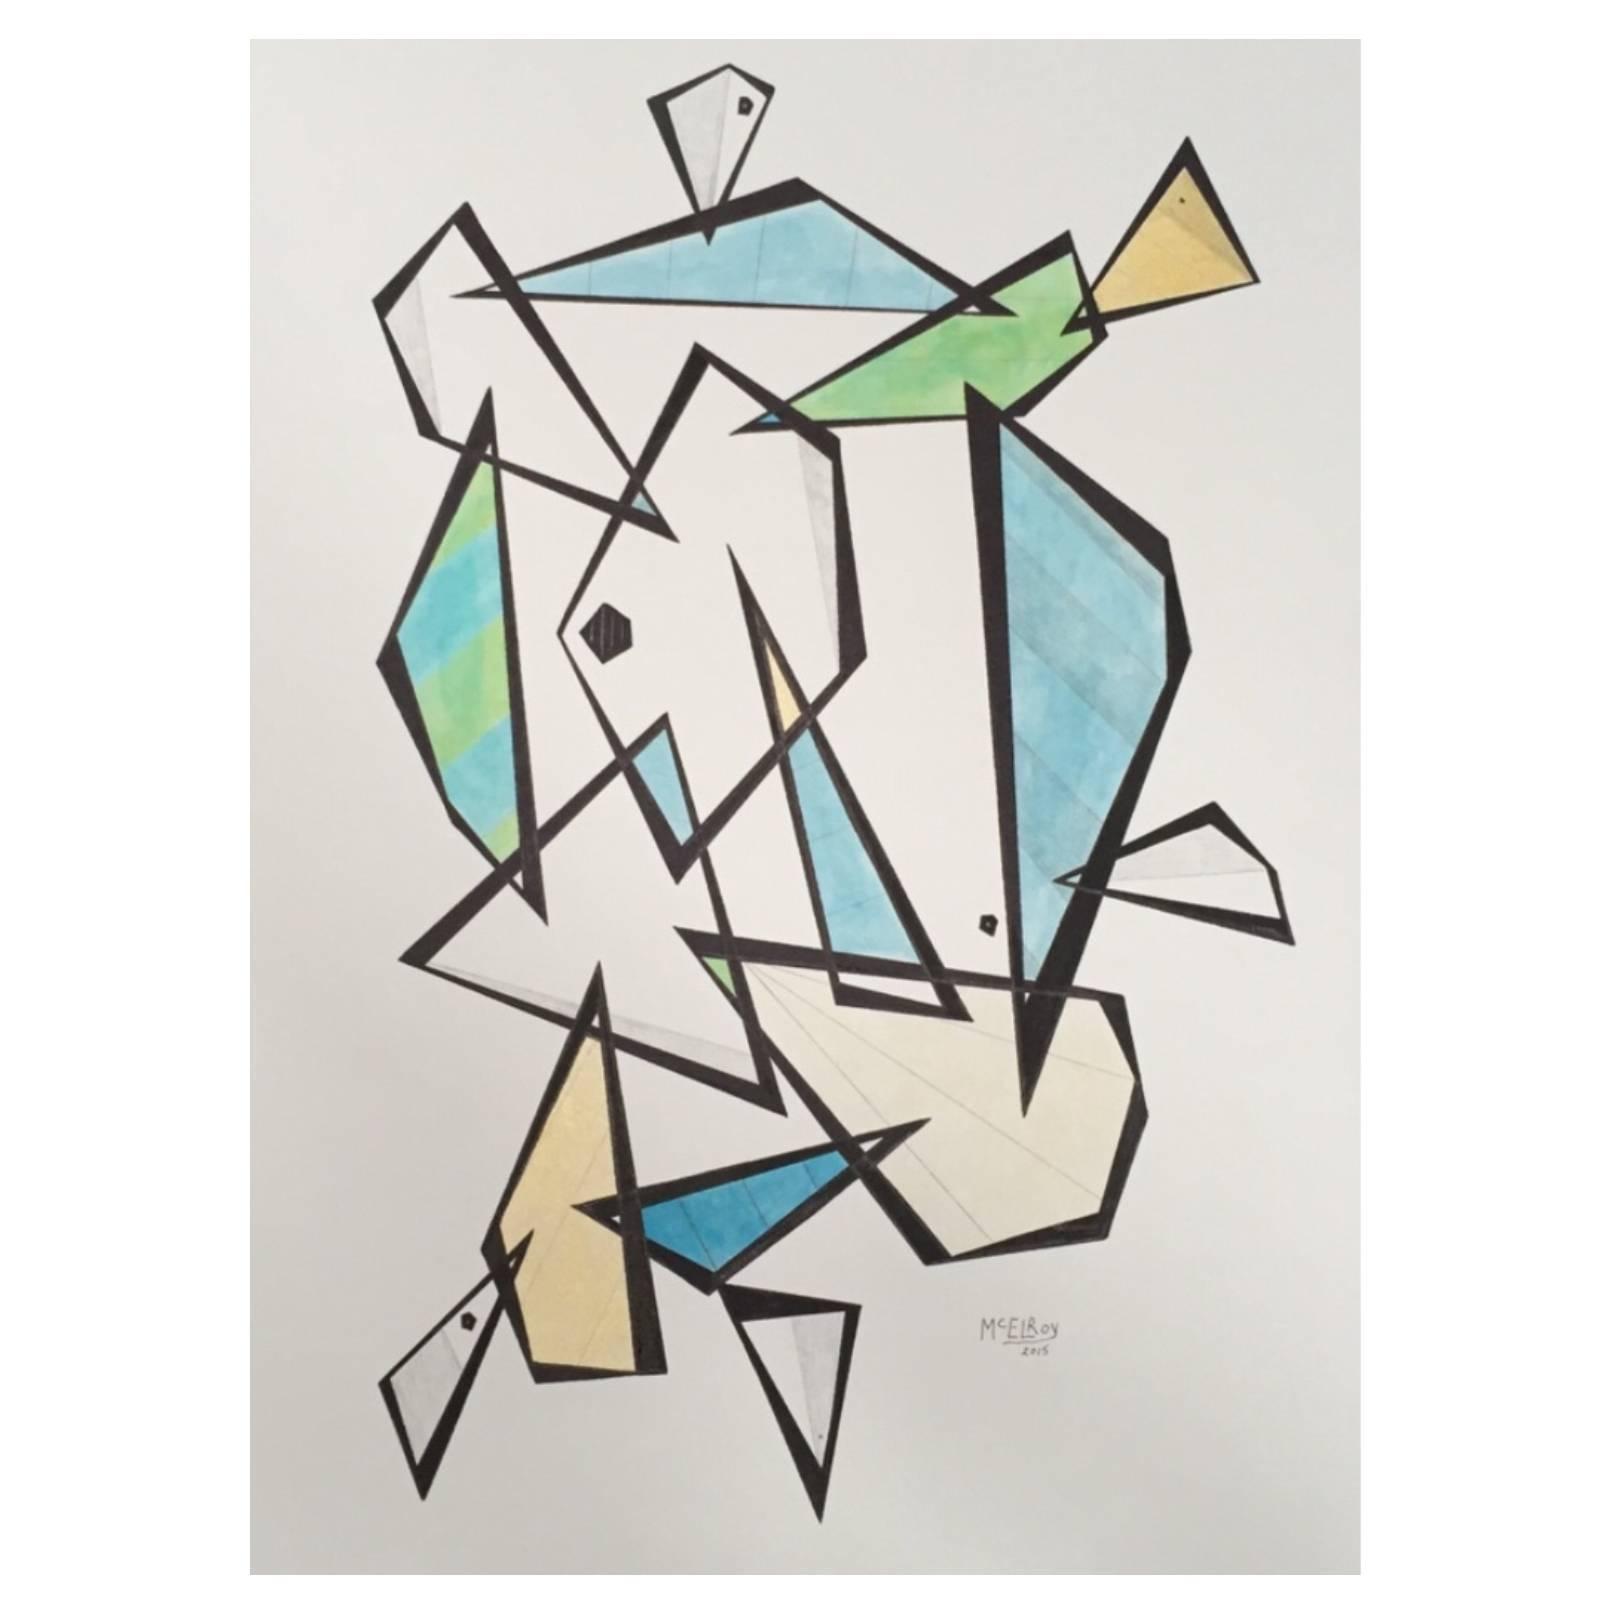 Steve McElroy Original India Ink and Pencil Drawing on Paper, Signed, Framed